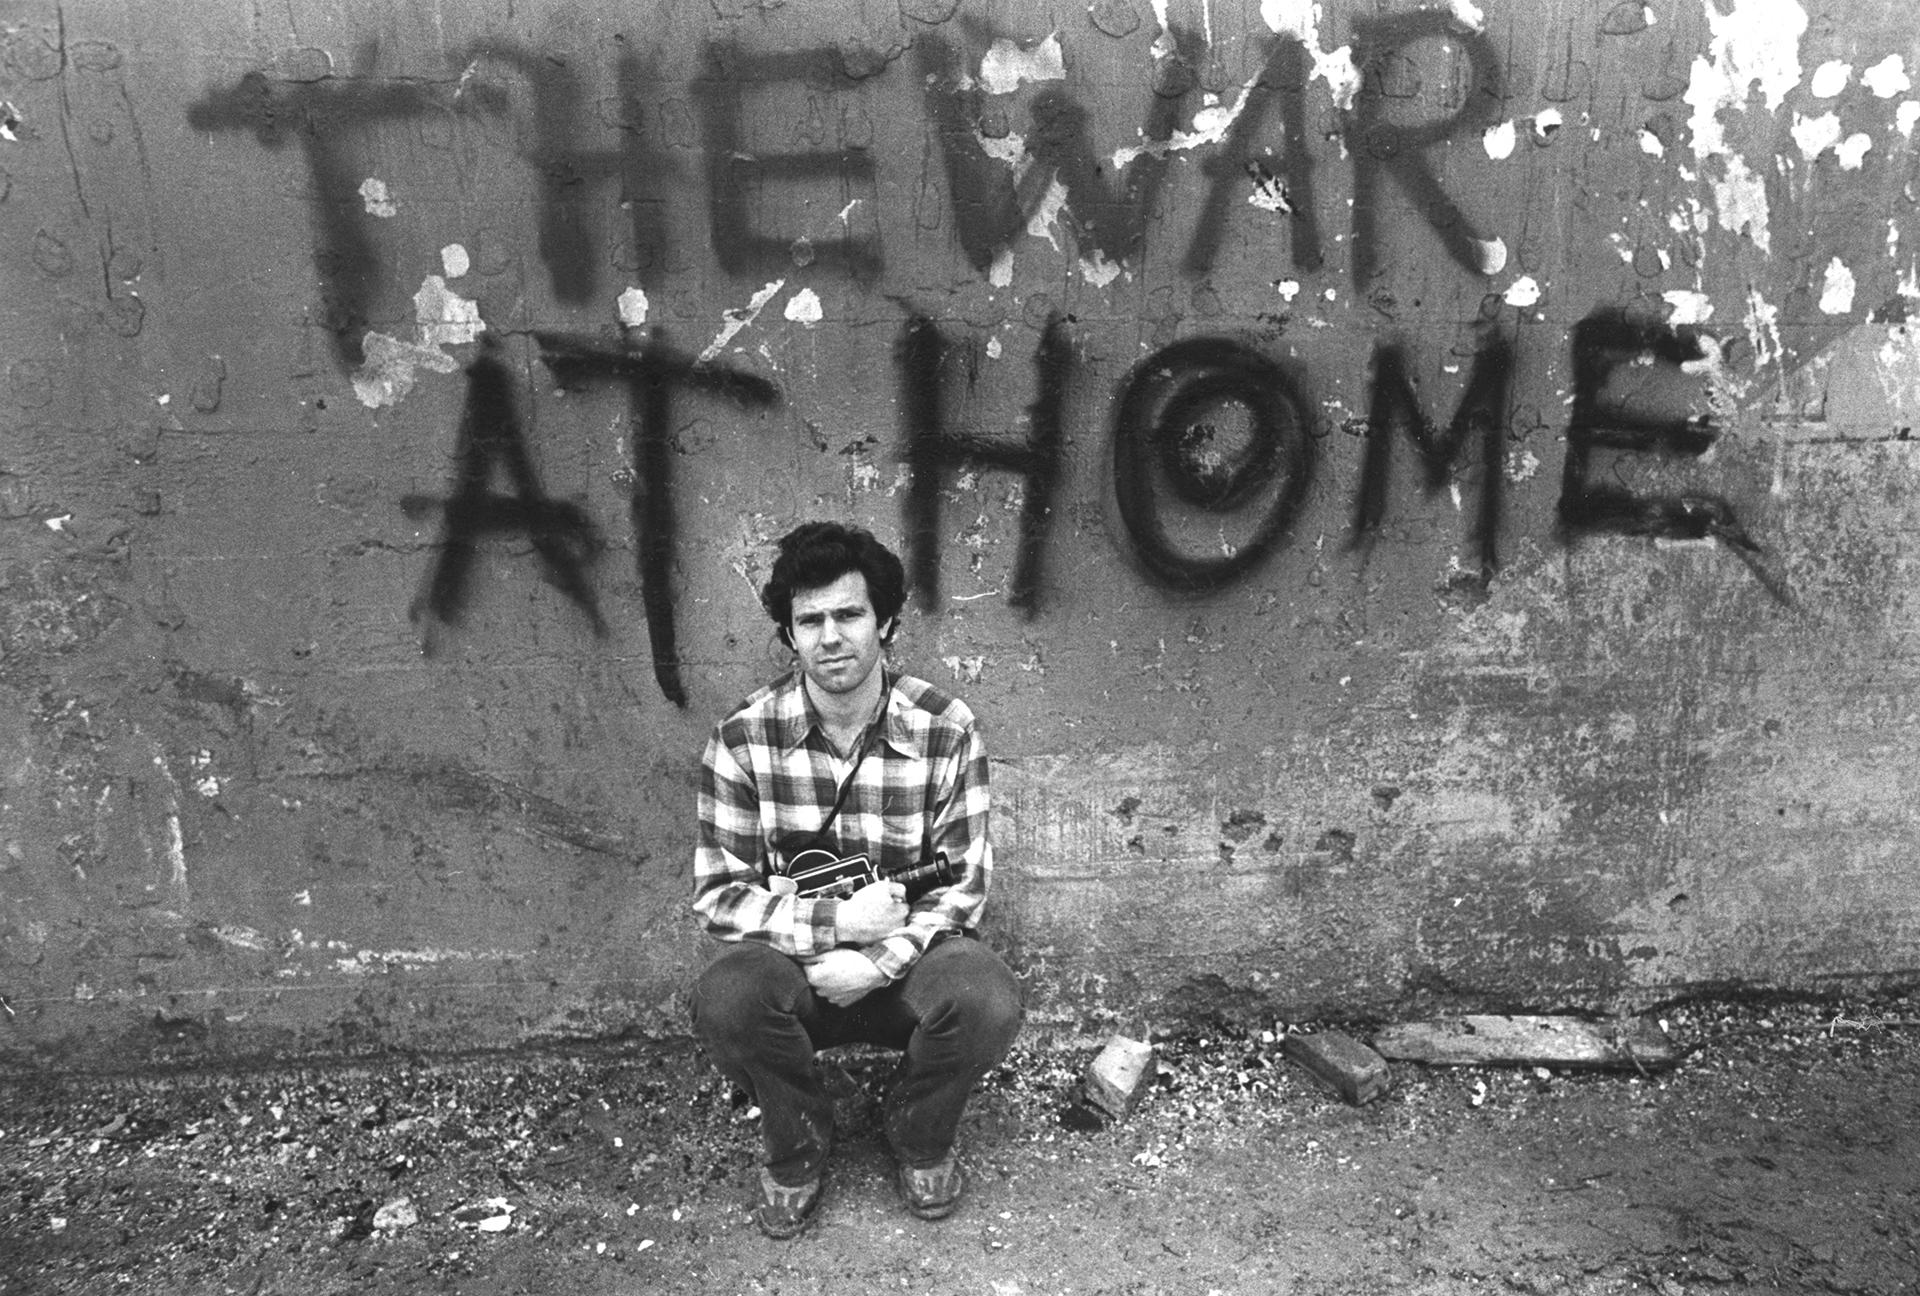 The War at Home Glenn Silber 1979 by Michael Kienitz